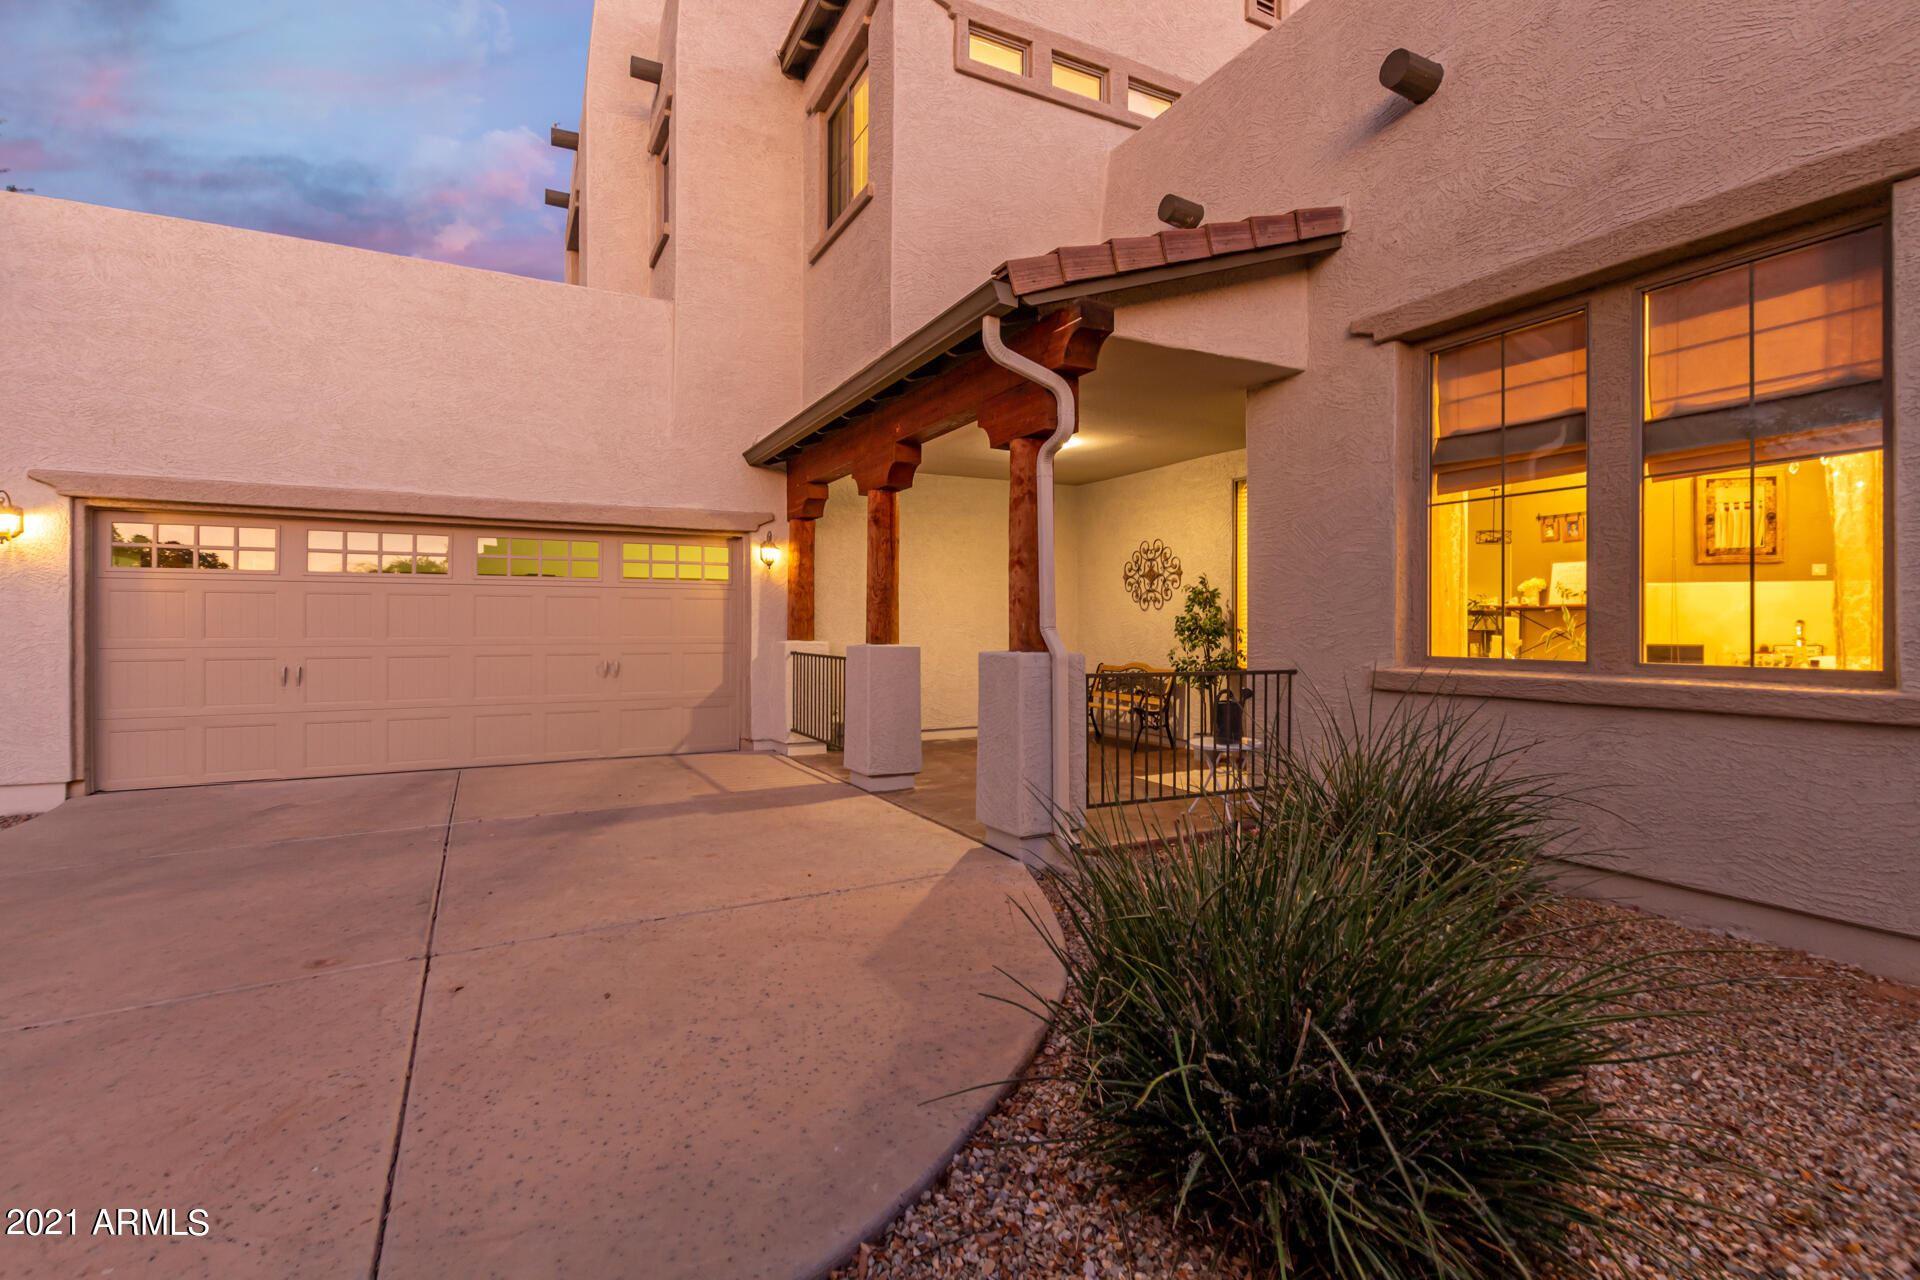 15659 W MEADOWBROOK Avenue, Goodyear, AZ 85395 - #: 6295725